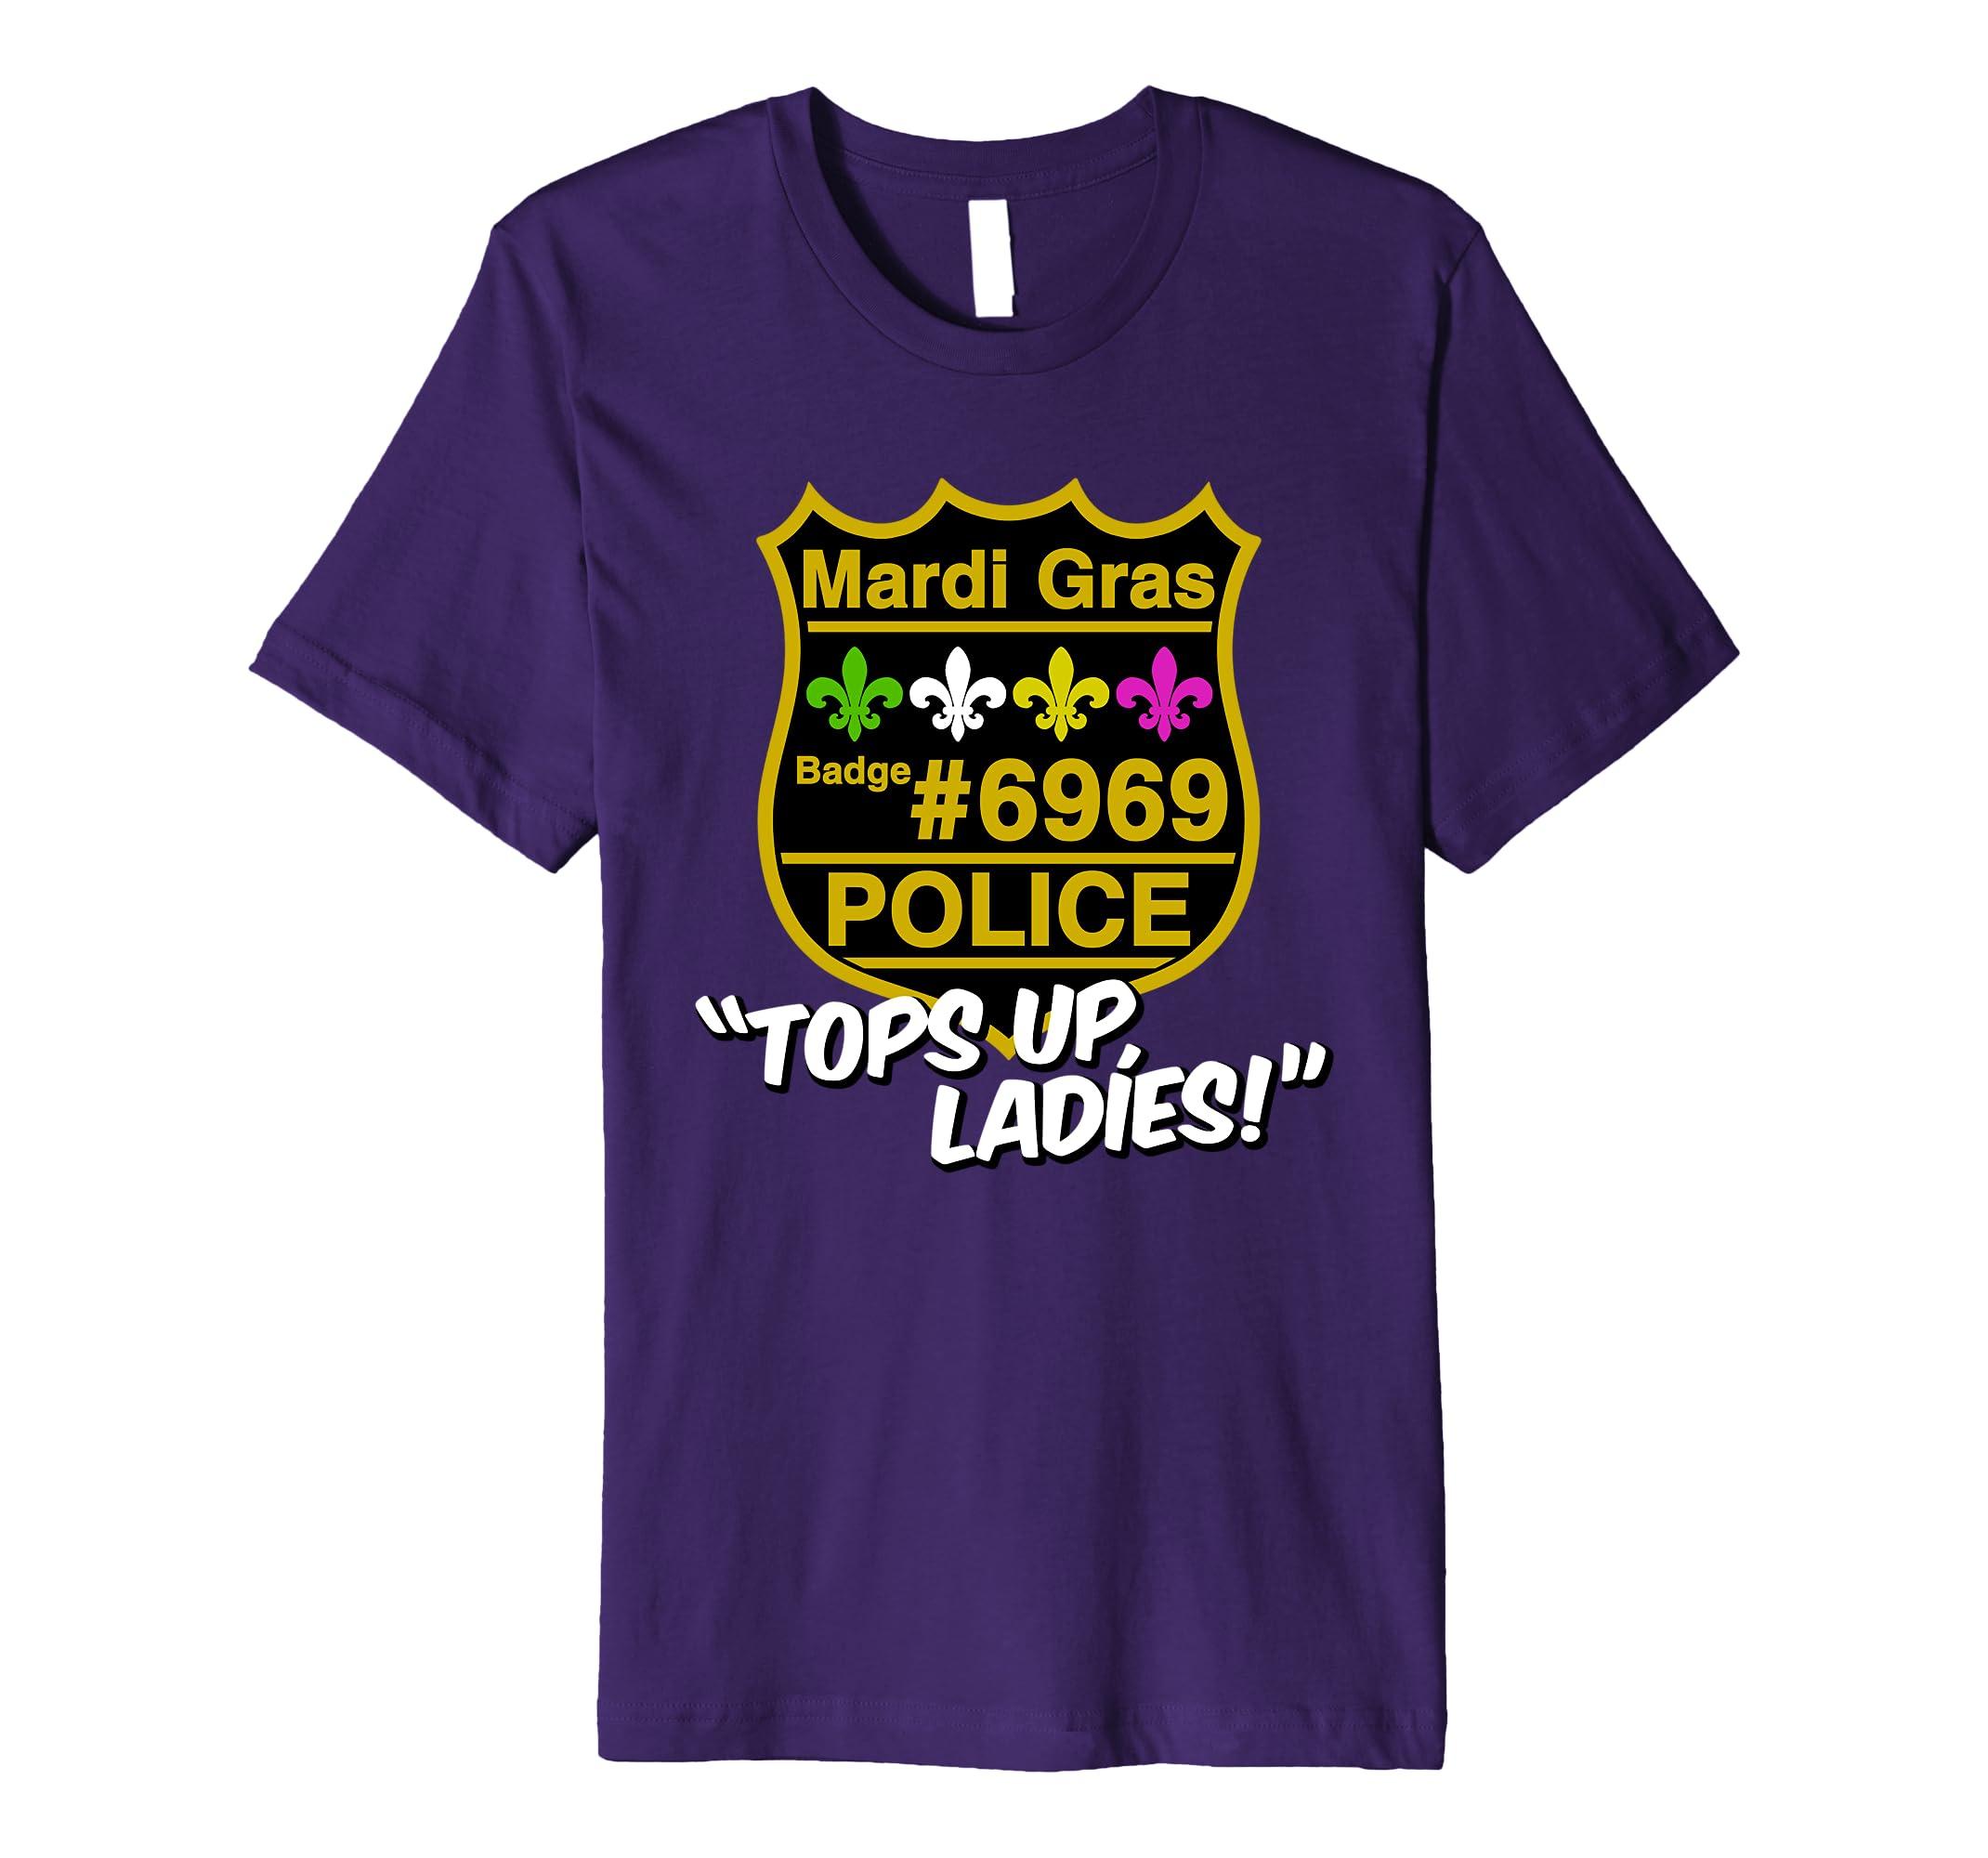 ffdda6a6 Amazon.com: Mardi Gras Police T-shirt Tops Up Ladies Funny NOLA Parade:  Clothing